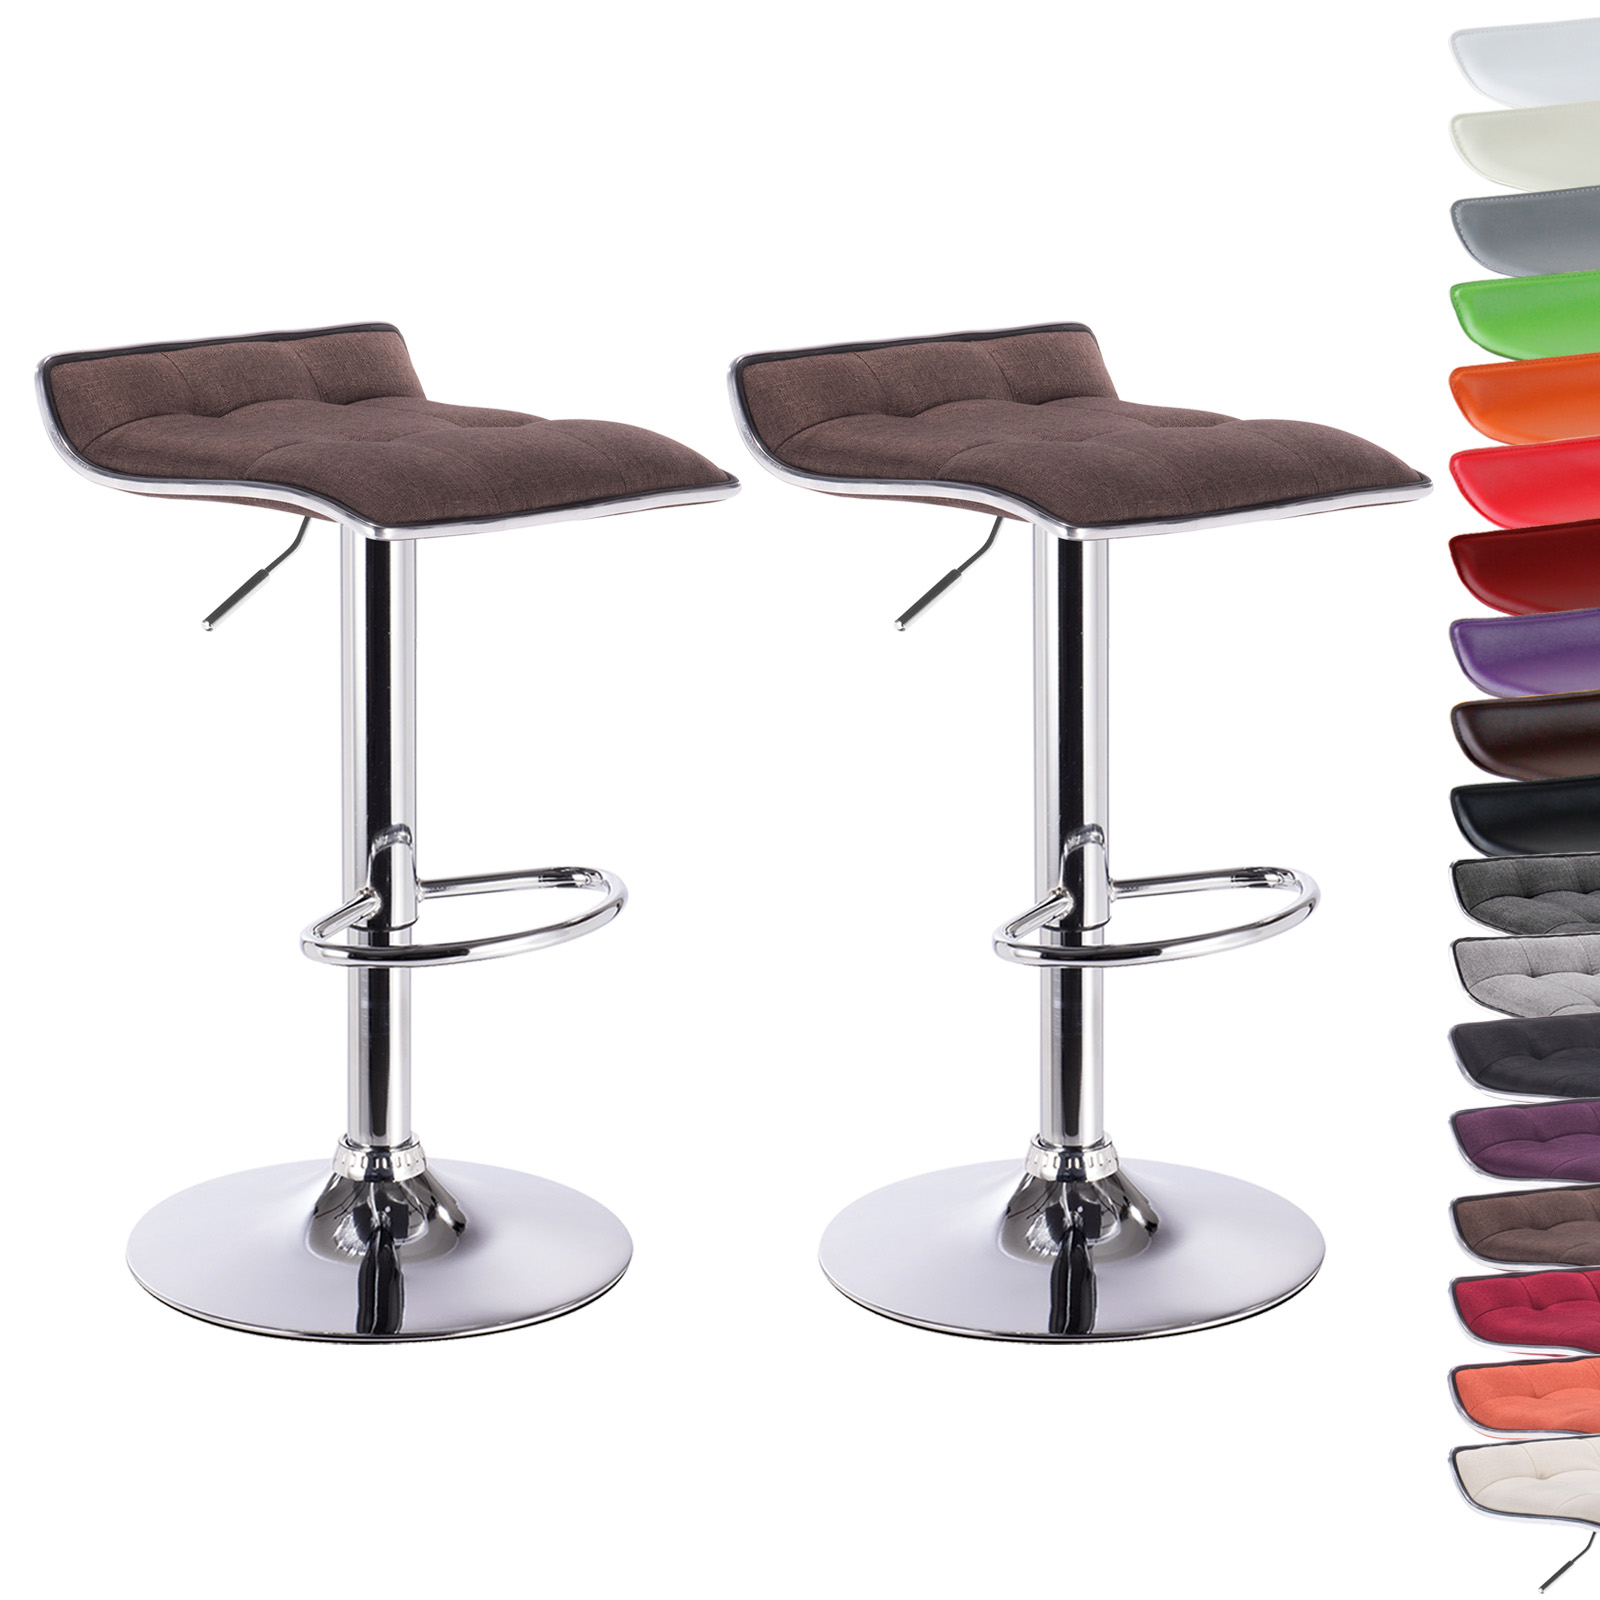 2 x barhocker barstuhl drehstuhl hocker lounge design bar for Design lounge stuhl